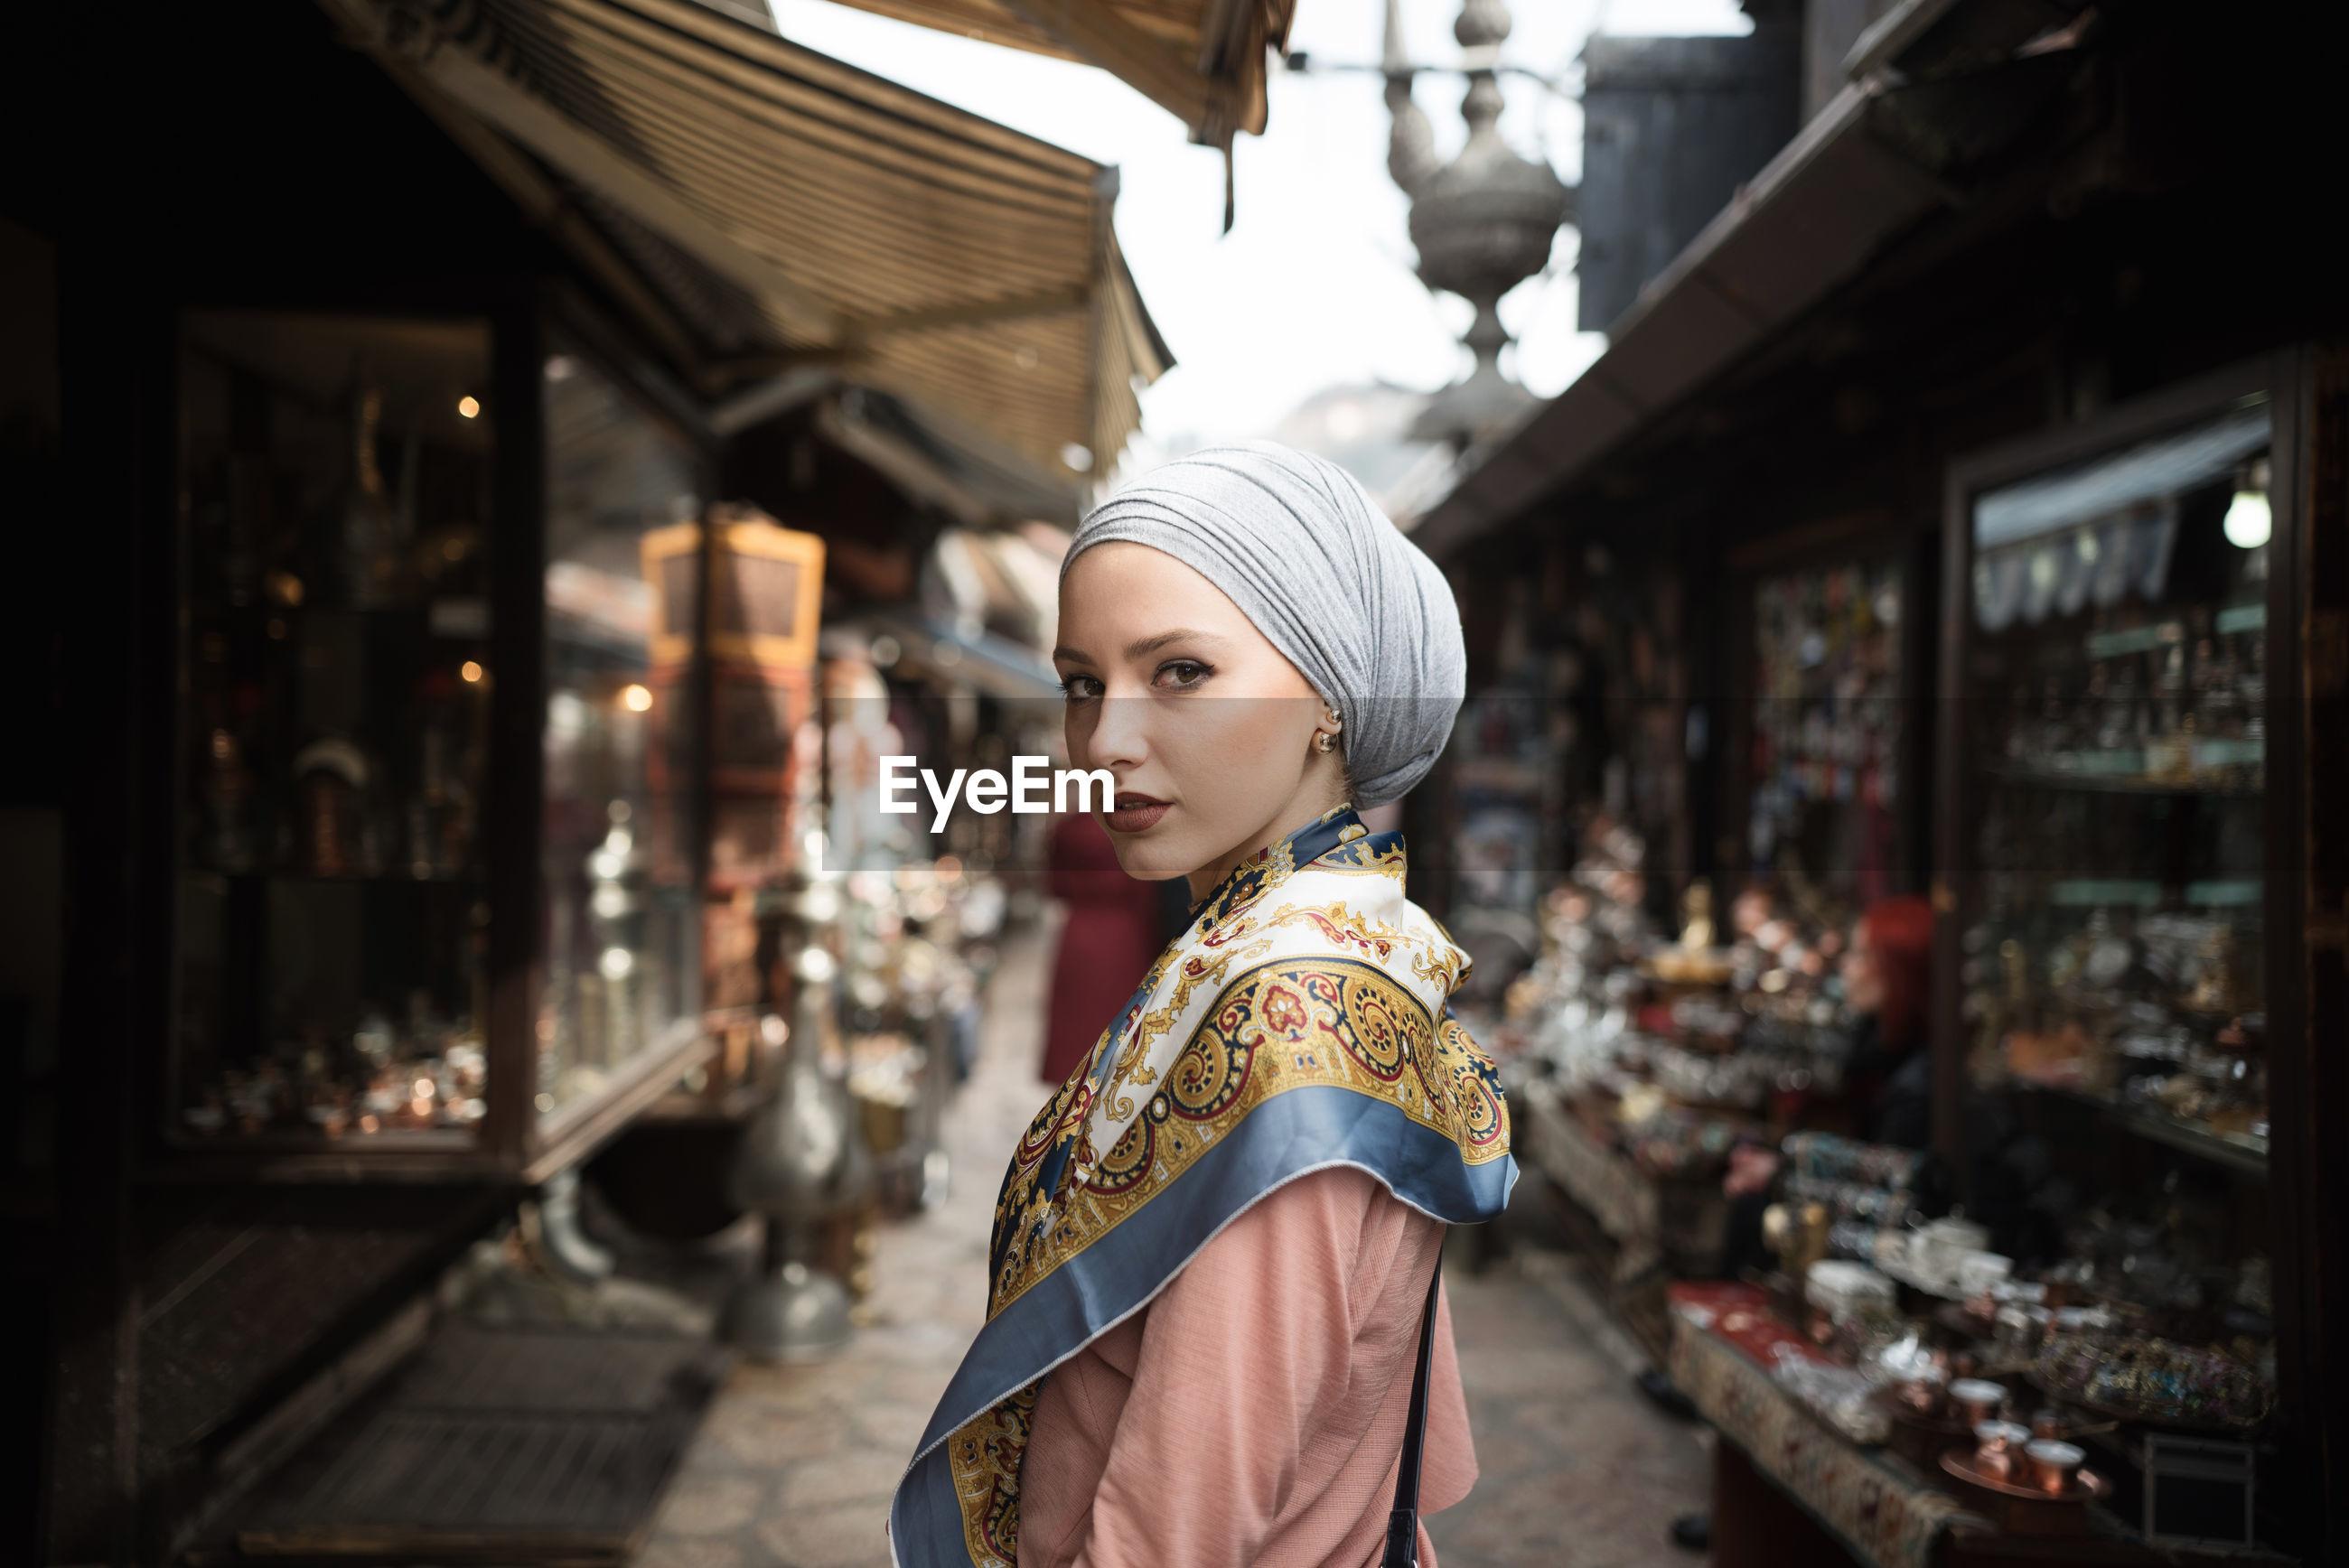 Woman standing amongst market stalls